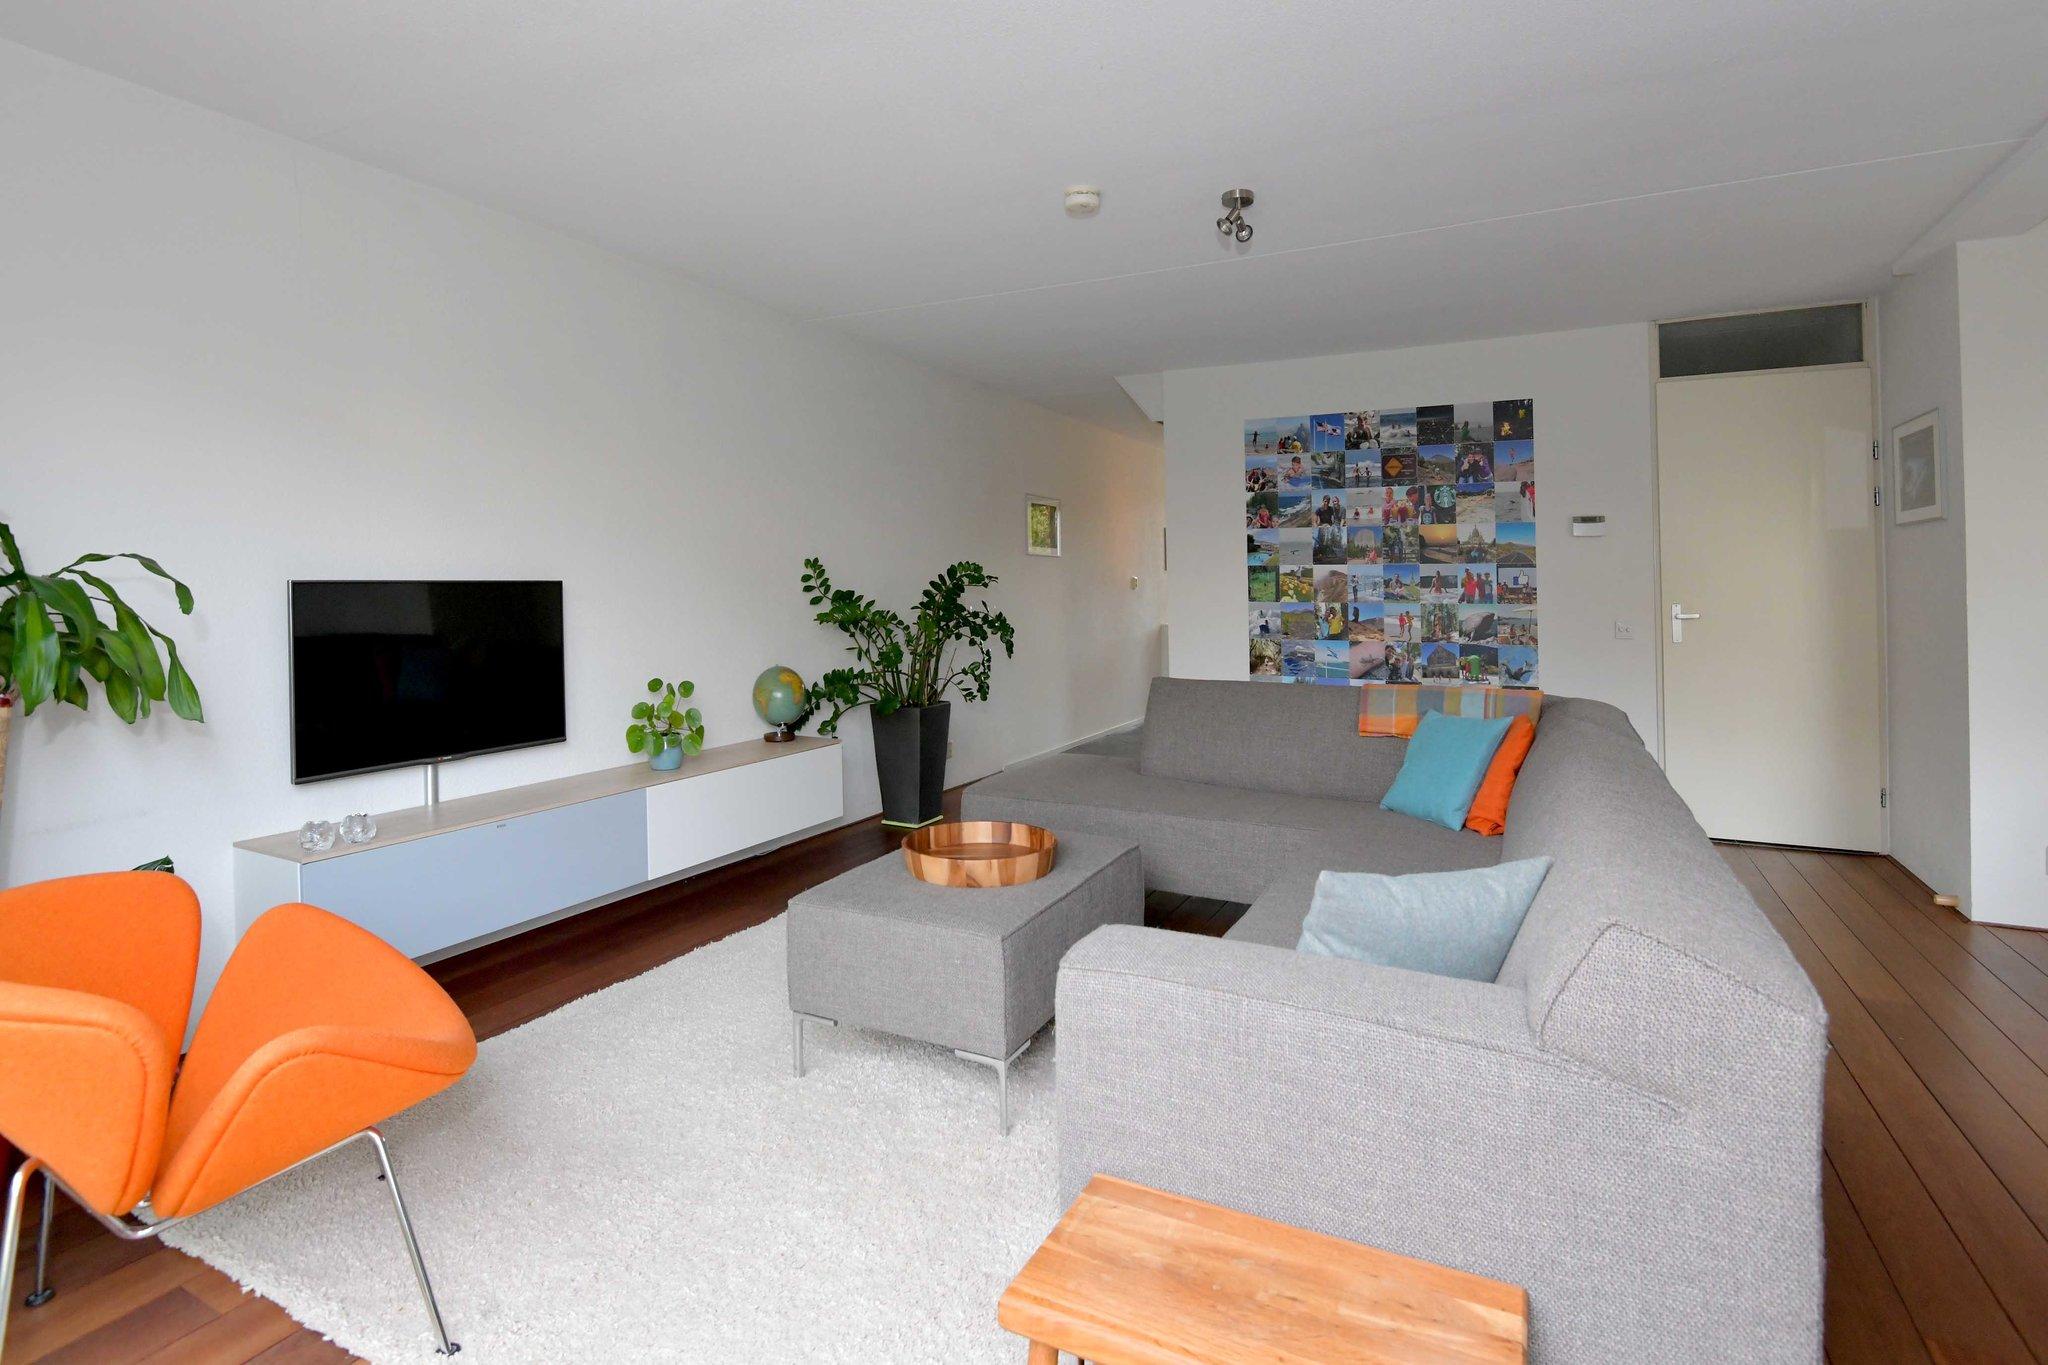 deventer-willem-landrestraat-4226710-foto-7.jpg